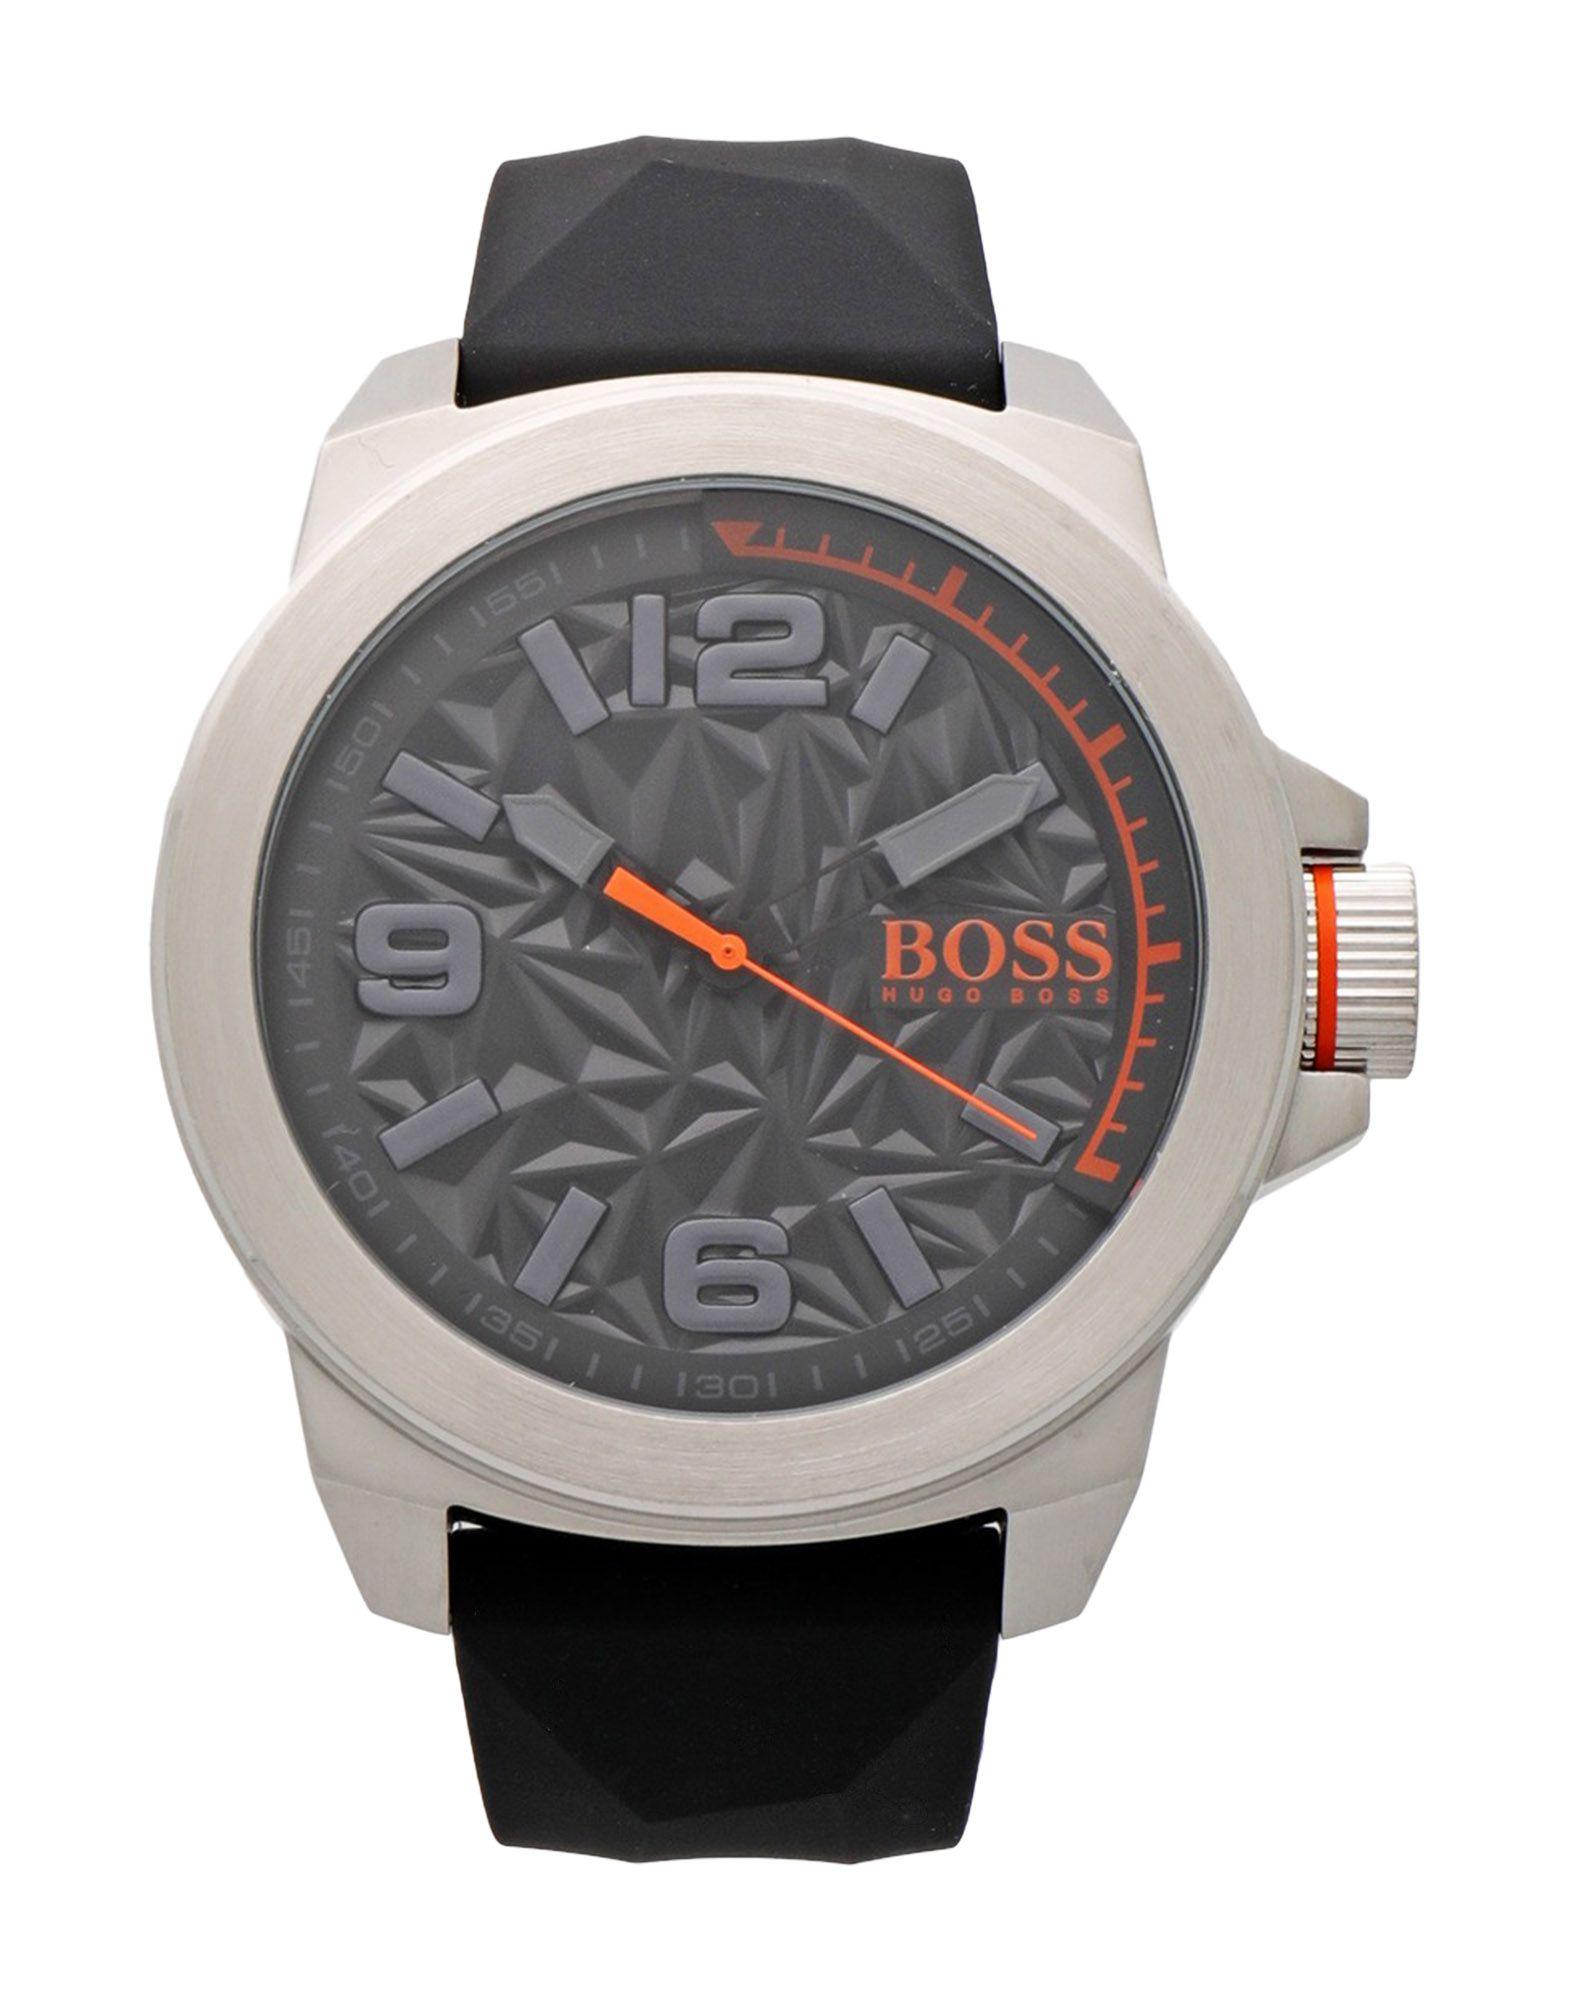 BOSS HUGO BOSS Наручные часы цена и фото